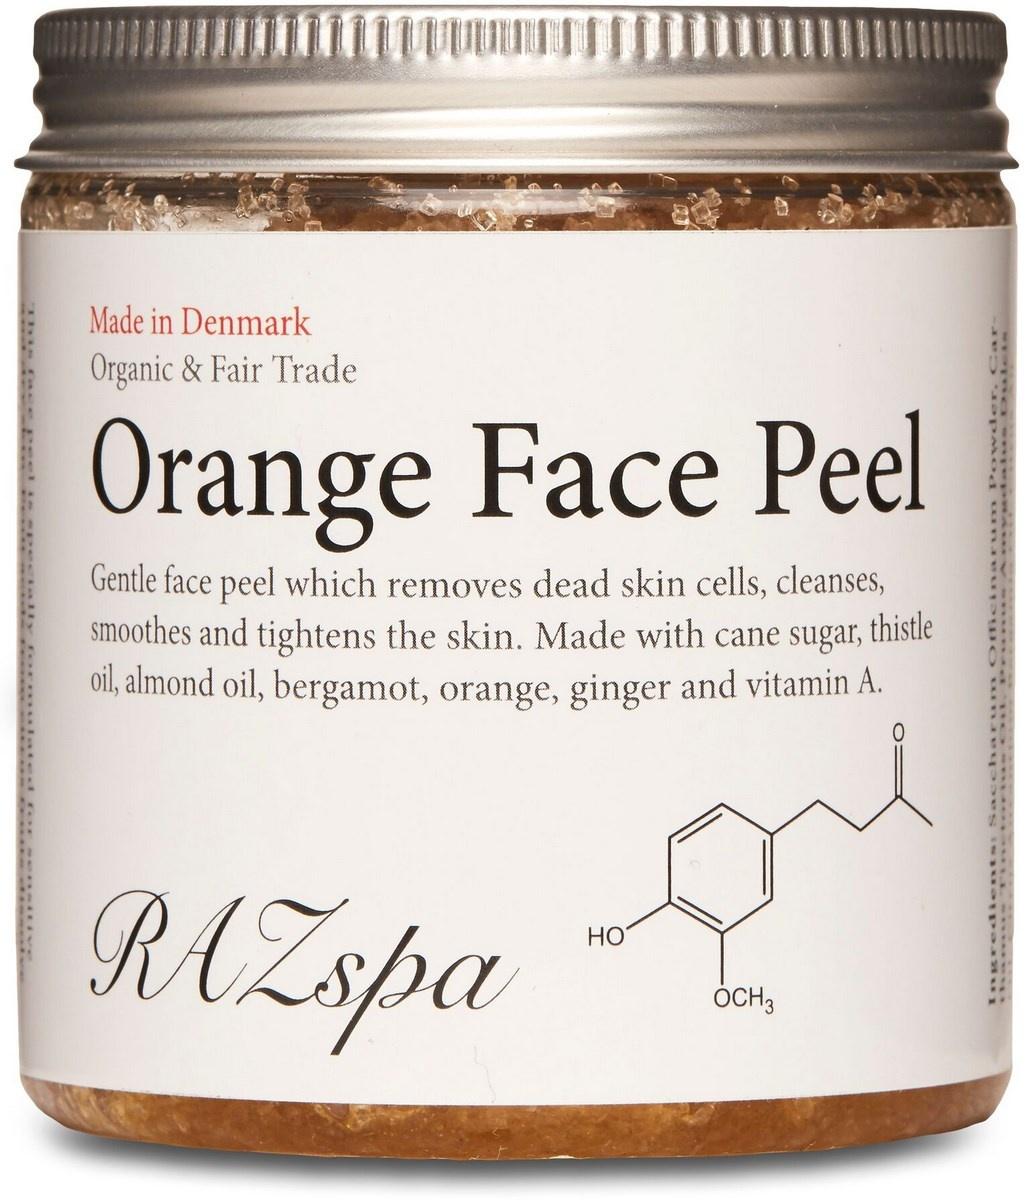 RAZspa Orange Face Peel, 200 g